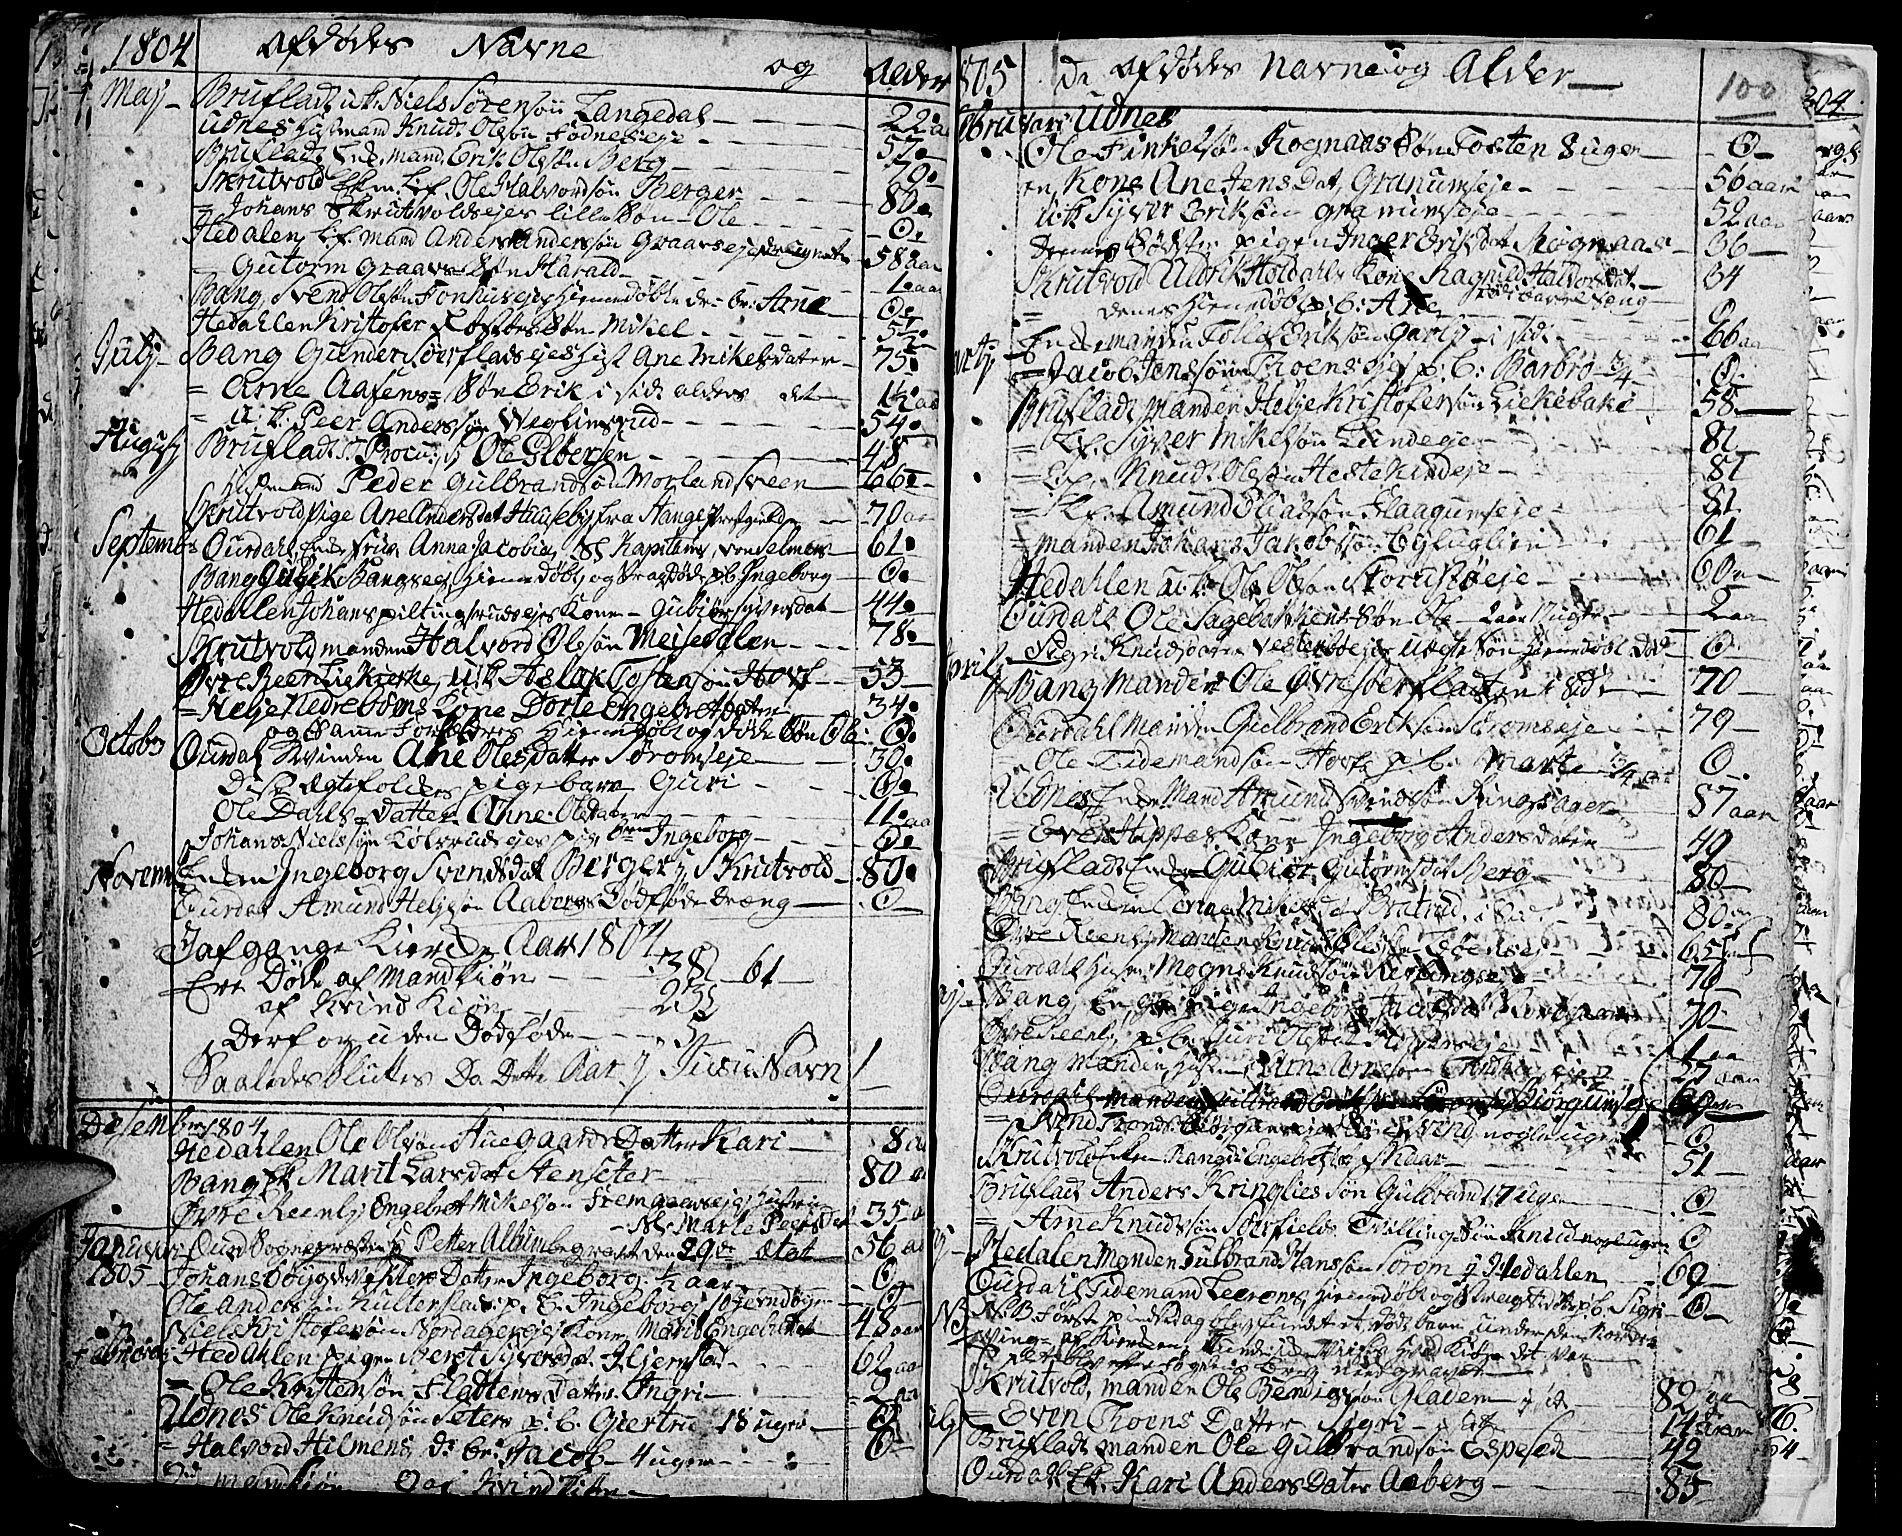 SAH, Aurdal prestekontor, Ministerialbok nr. 7, 1800-1808, s. 100